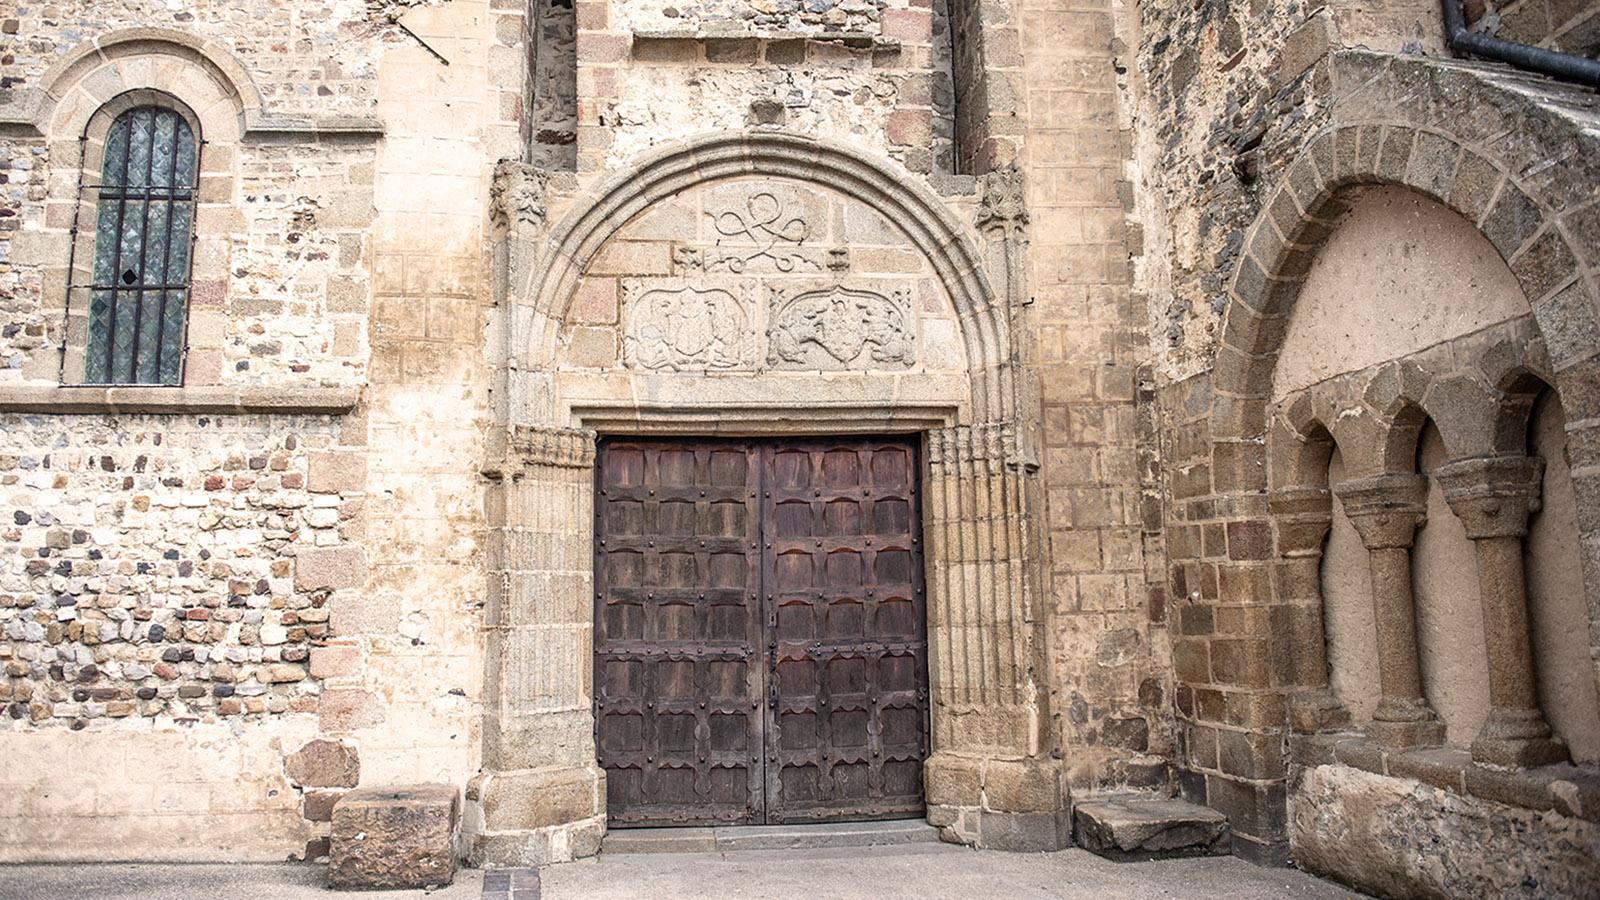 L'abbaye Notre-Dame de l'Épine d'Évron: die Fassade der Abteikirche. Foto: Hilke Maunder